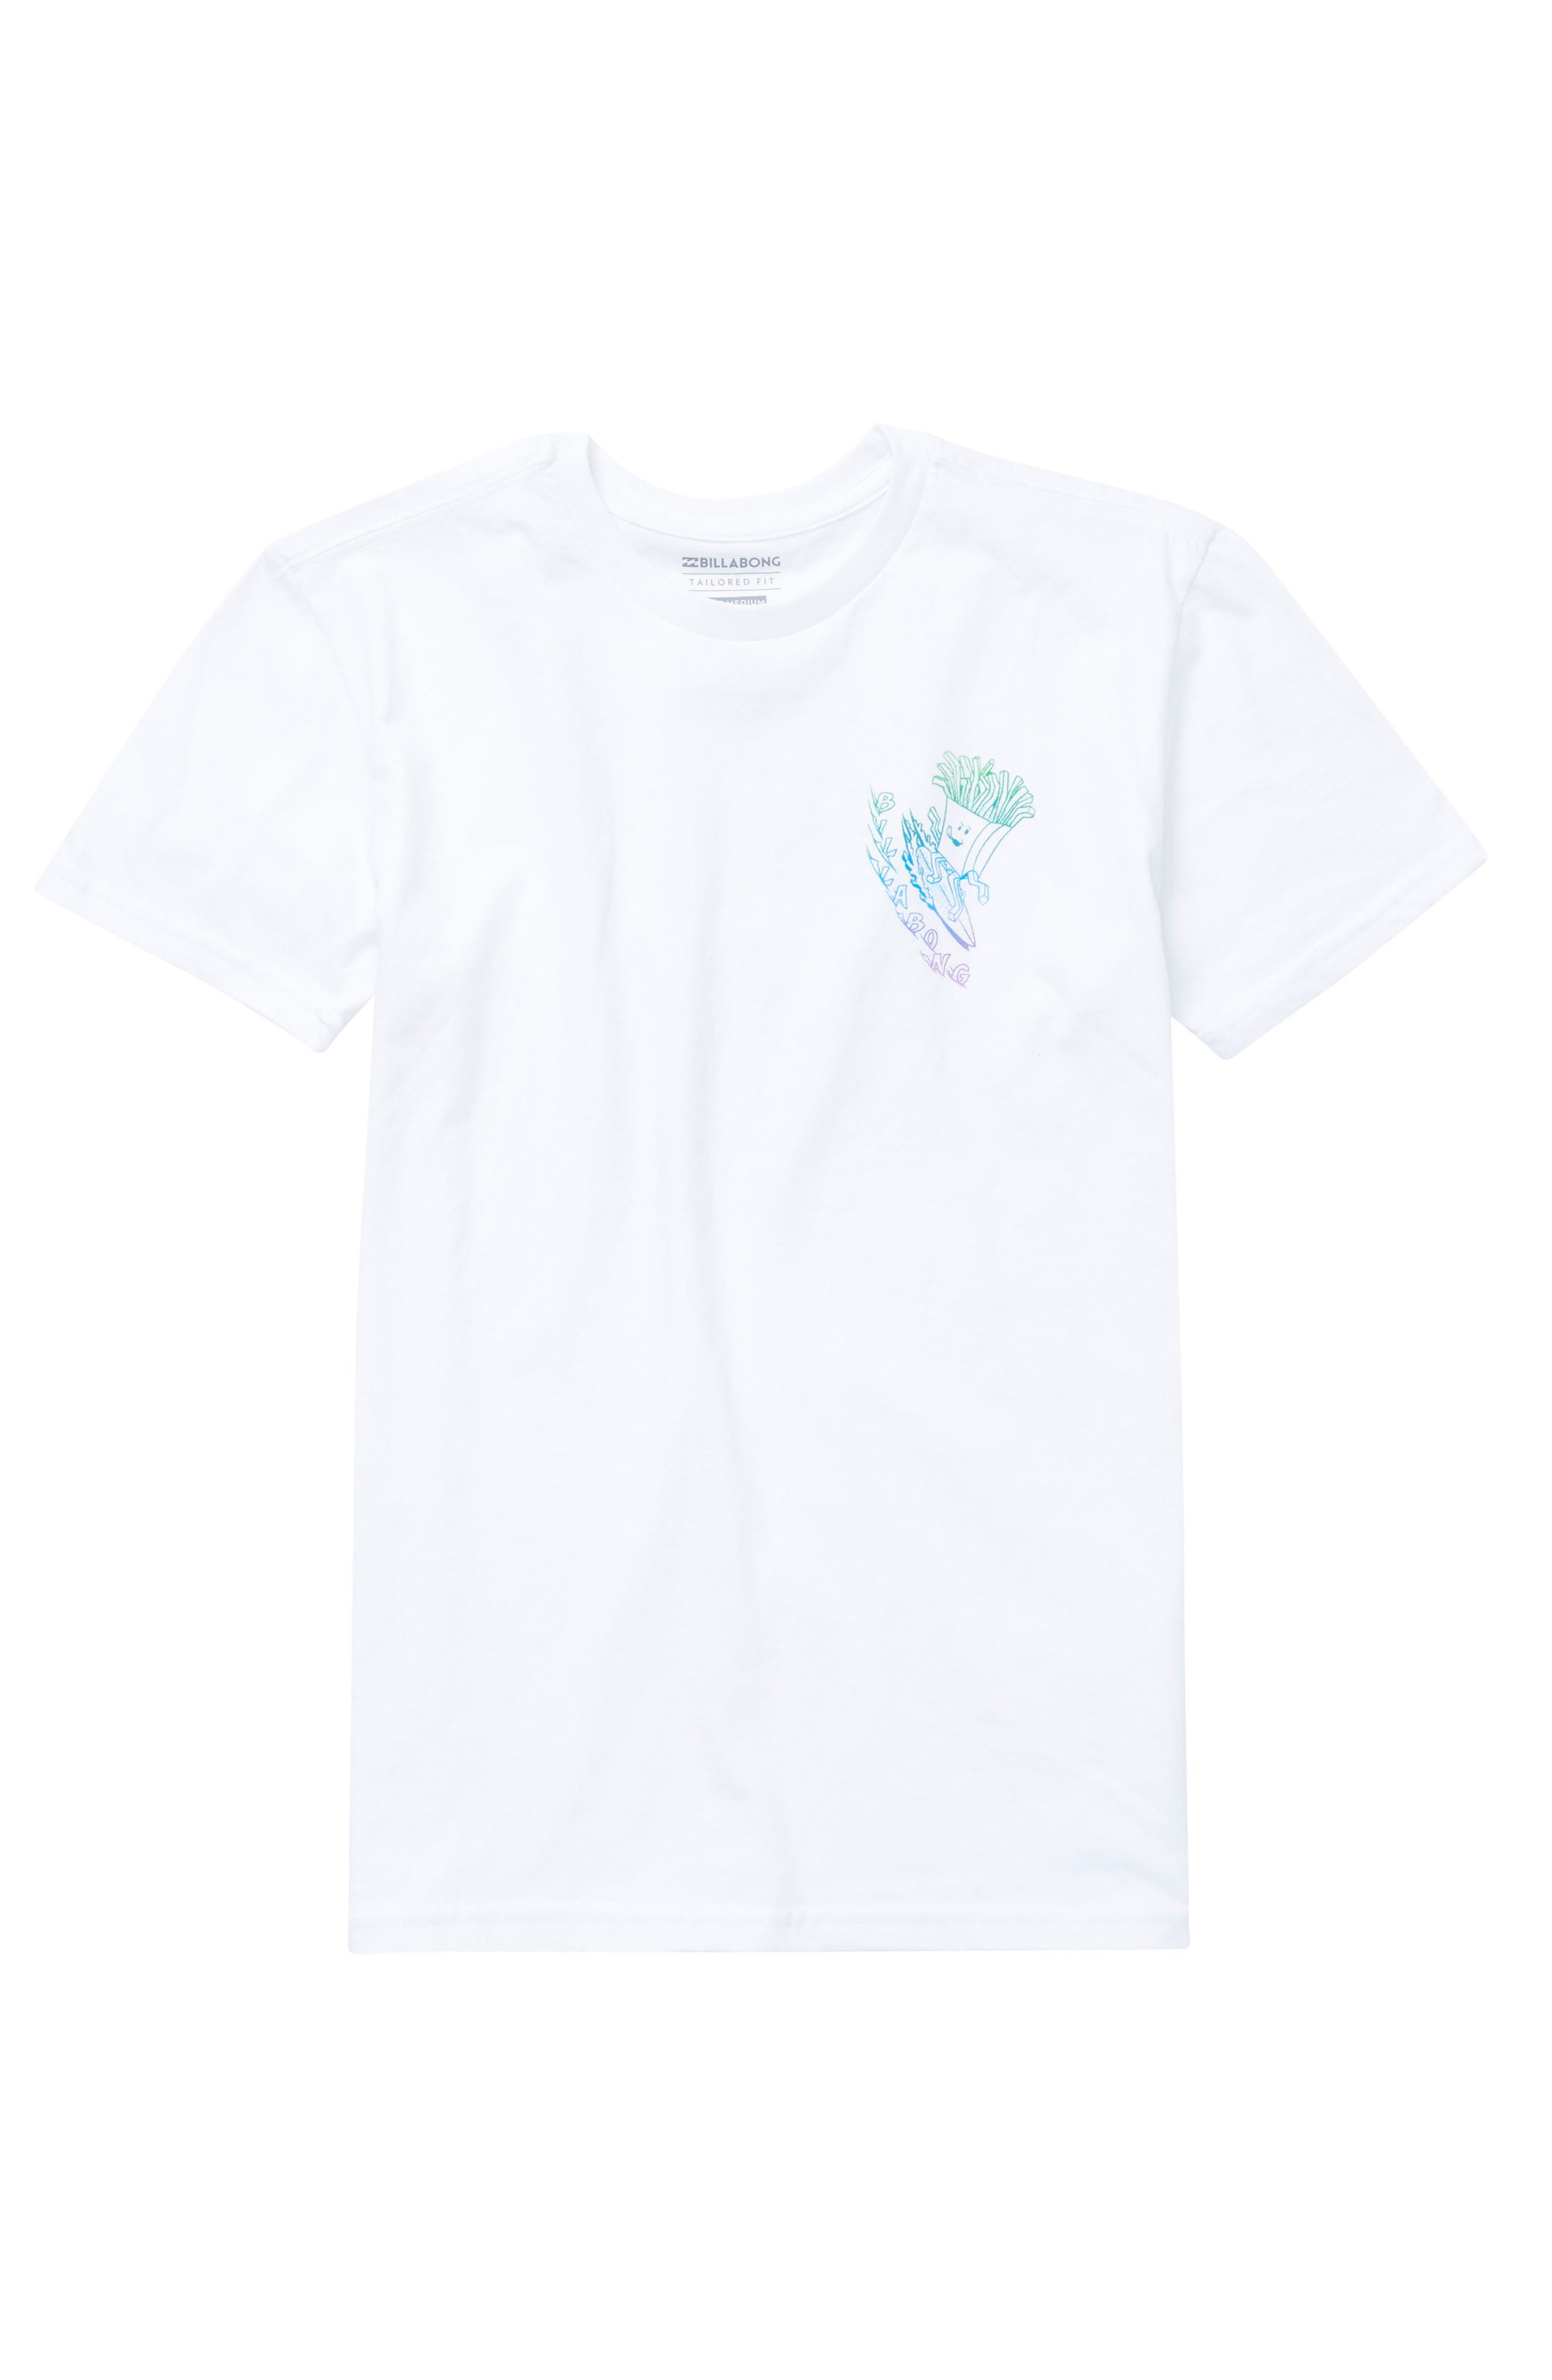 Snacks & Shacks Graphic T-Shirt,                             Alternate thumbnail 4, color,